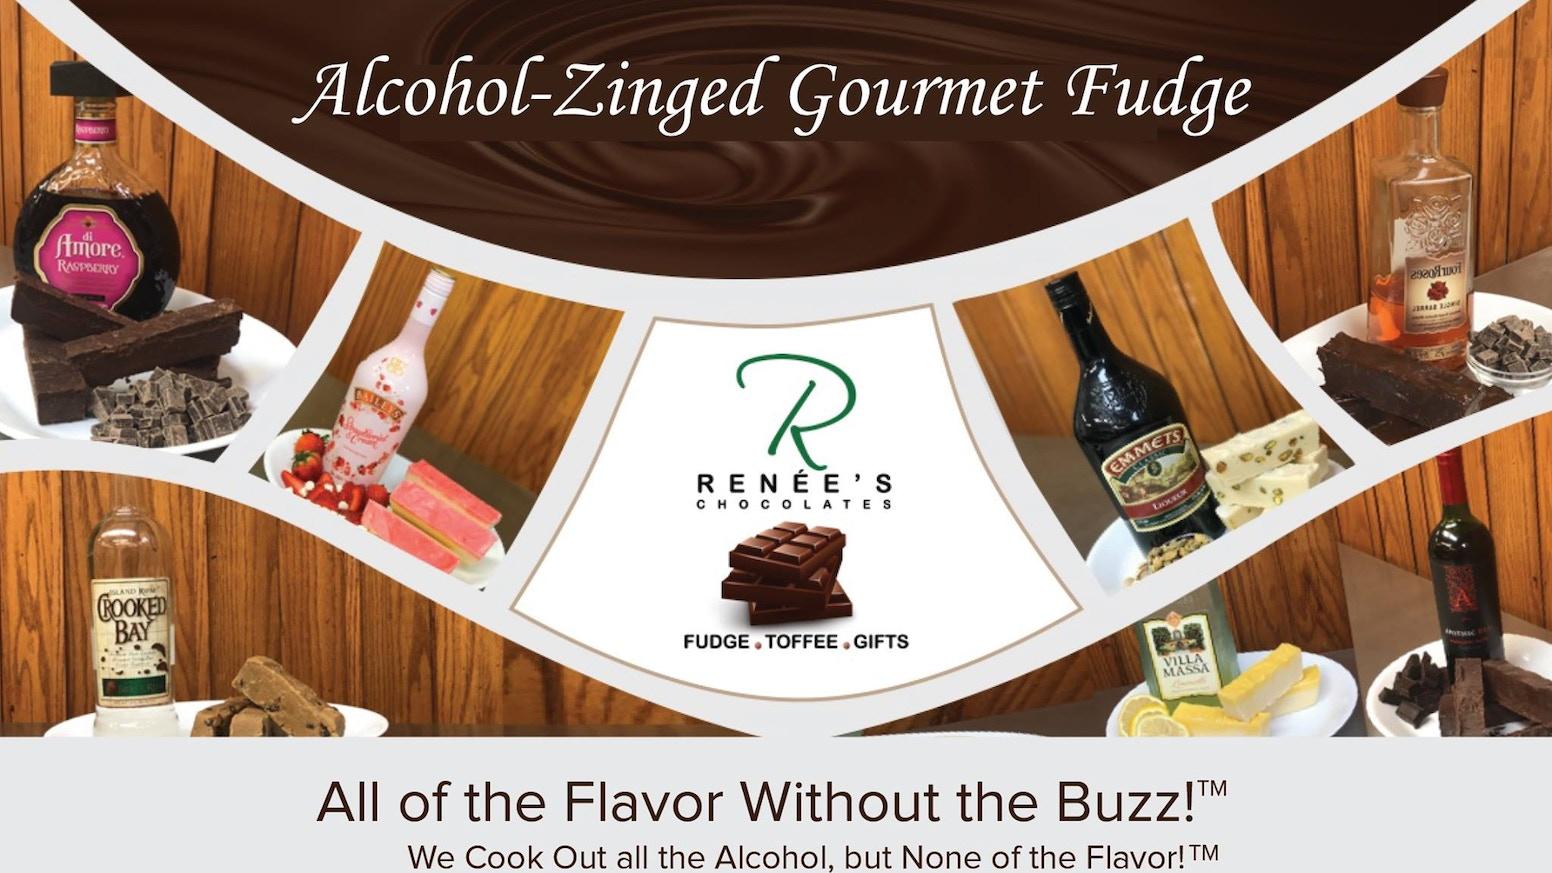 Alcohol-Zinged Gourmet Fudge! Help Create Jobs! by Renée's